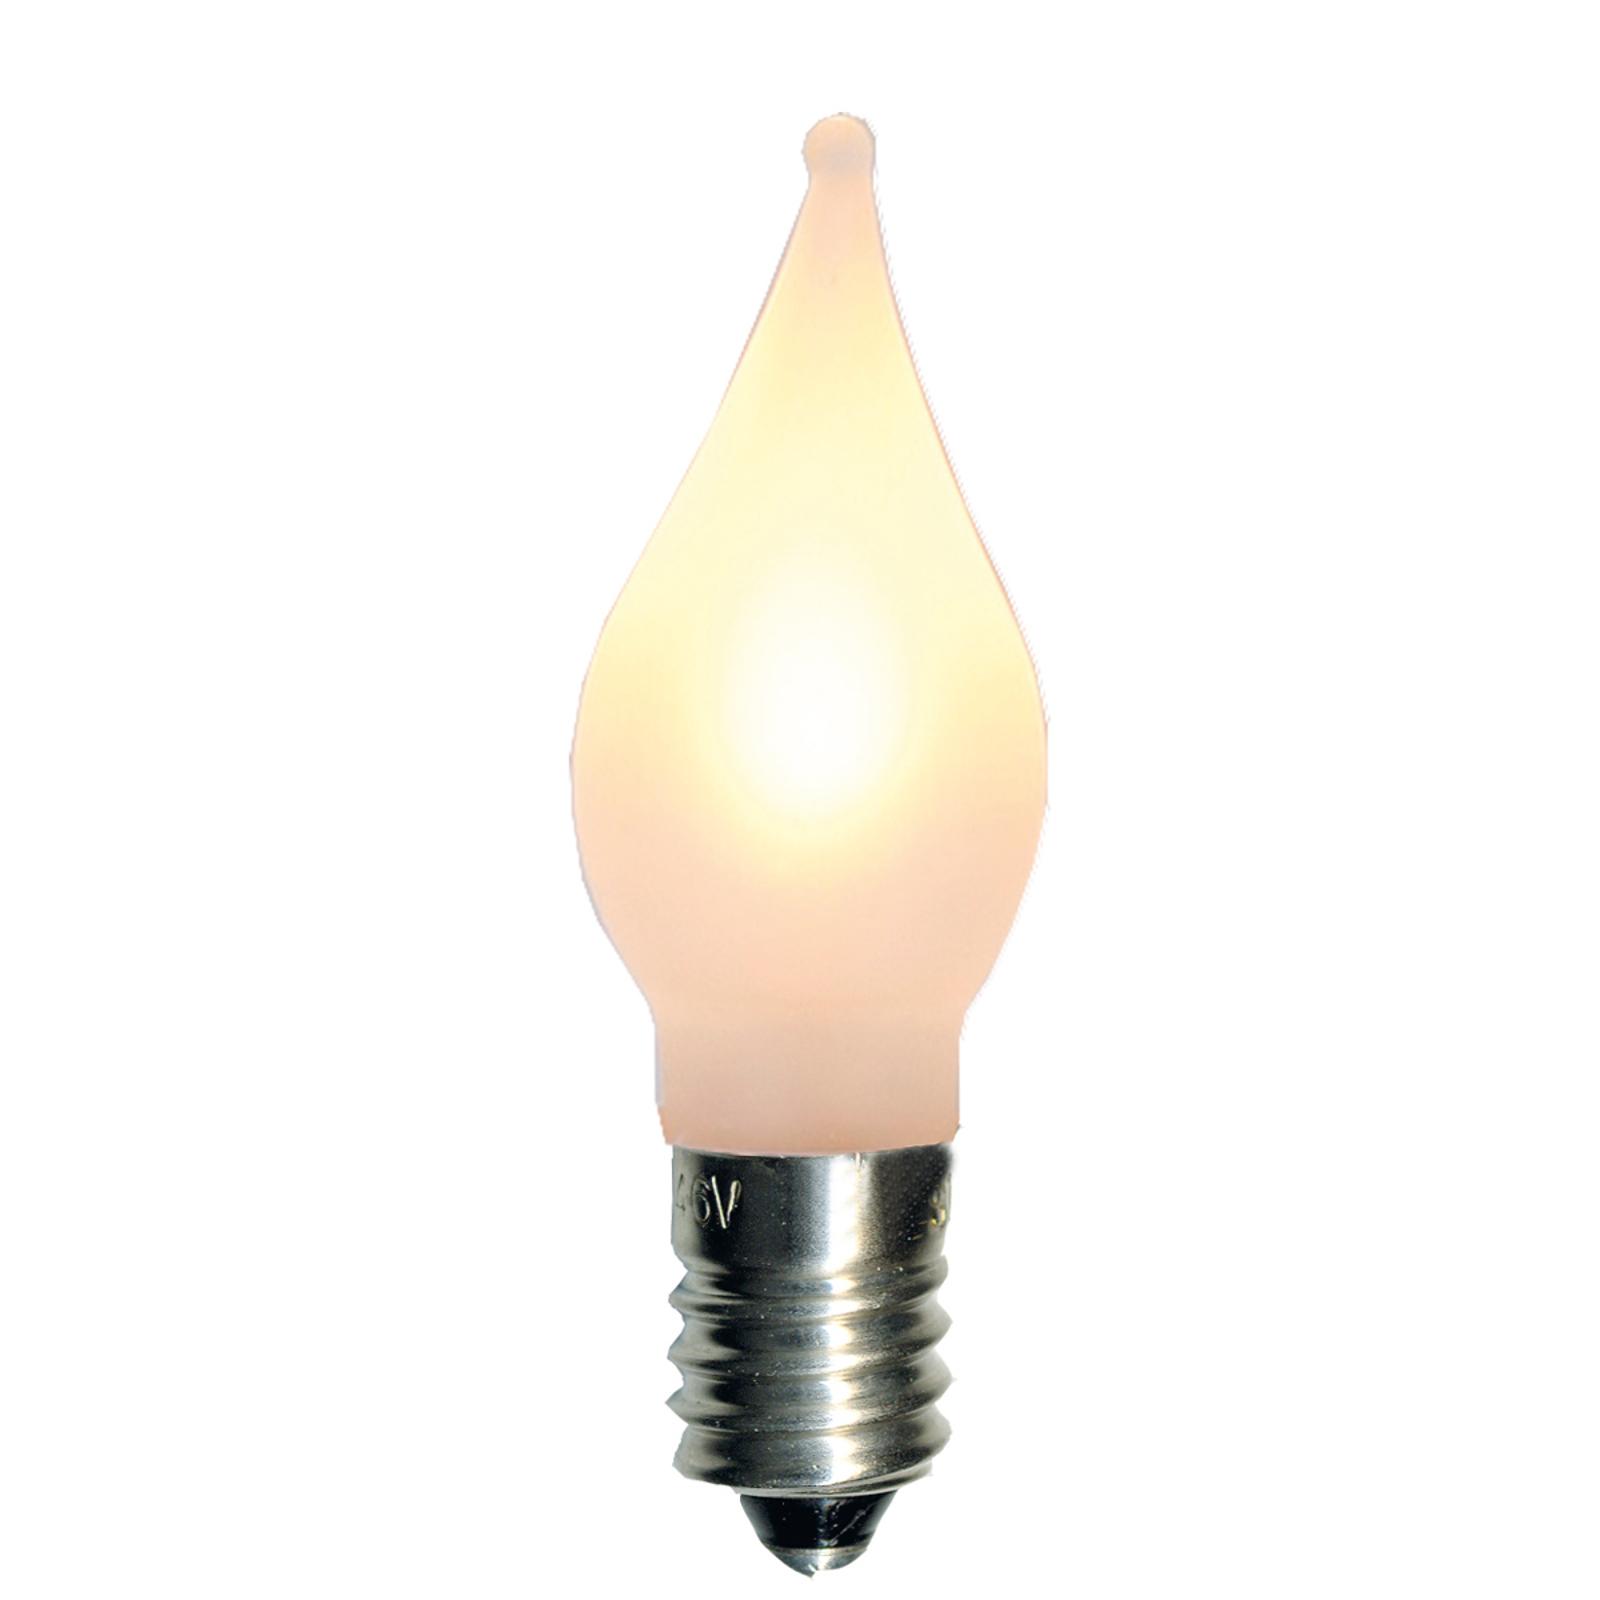 E10 0,1W 10-55V LED náhradní žárovka 3ks